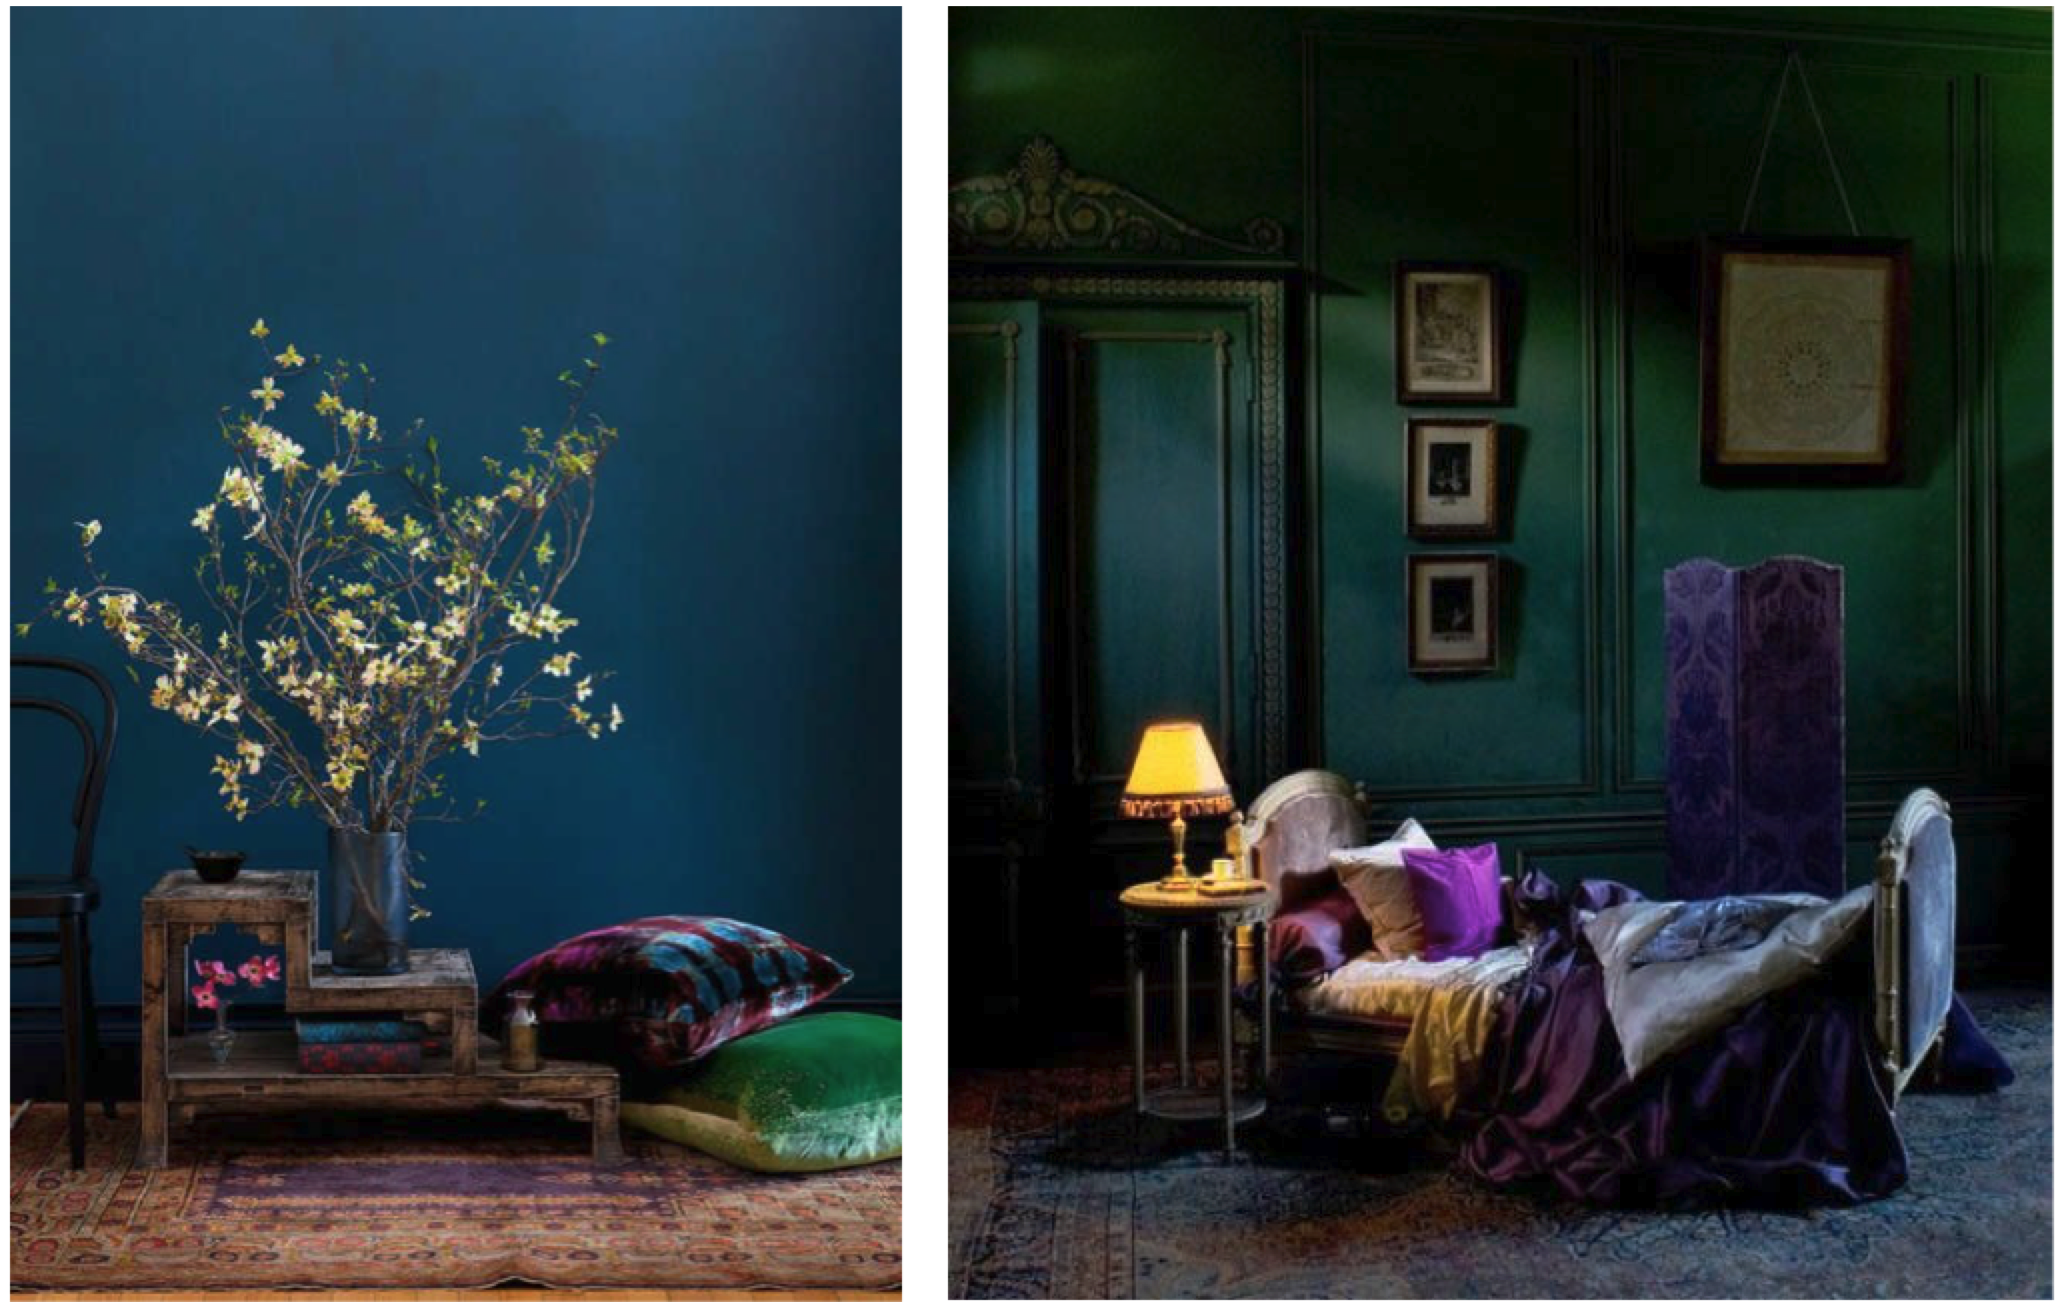 Jewel Tones On Your Walls Amykranecolor Com Jewel Tone Bedroom Jewel Toned Bedroom Decor Jewel Tone Room